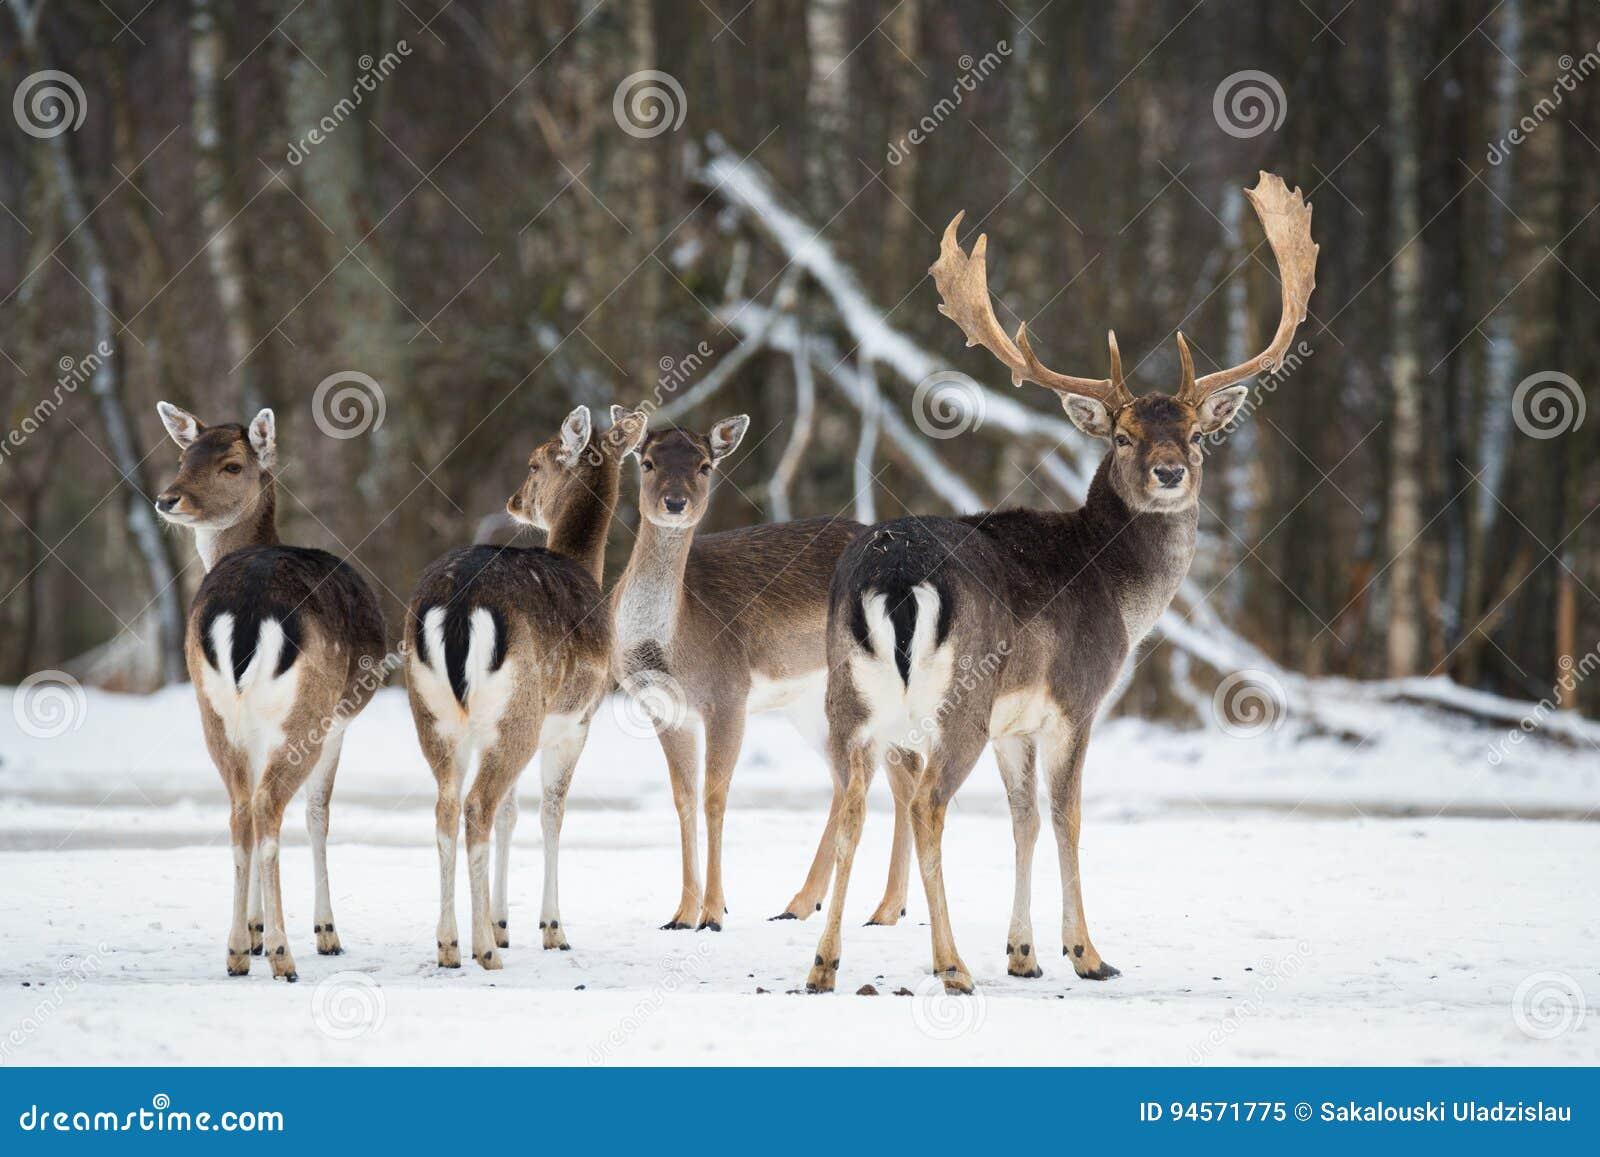 Fallow Deer, Dama dama, majestic adult animal in winter forest, Belarus. Small herd of fallow deers Dama dama .A group of Fallo